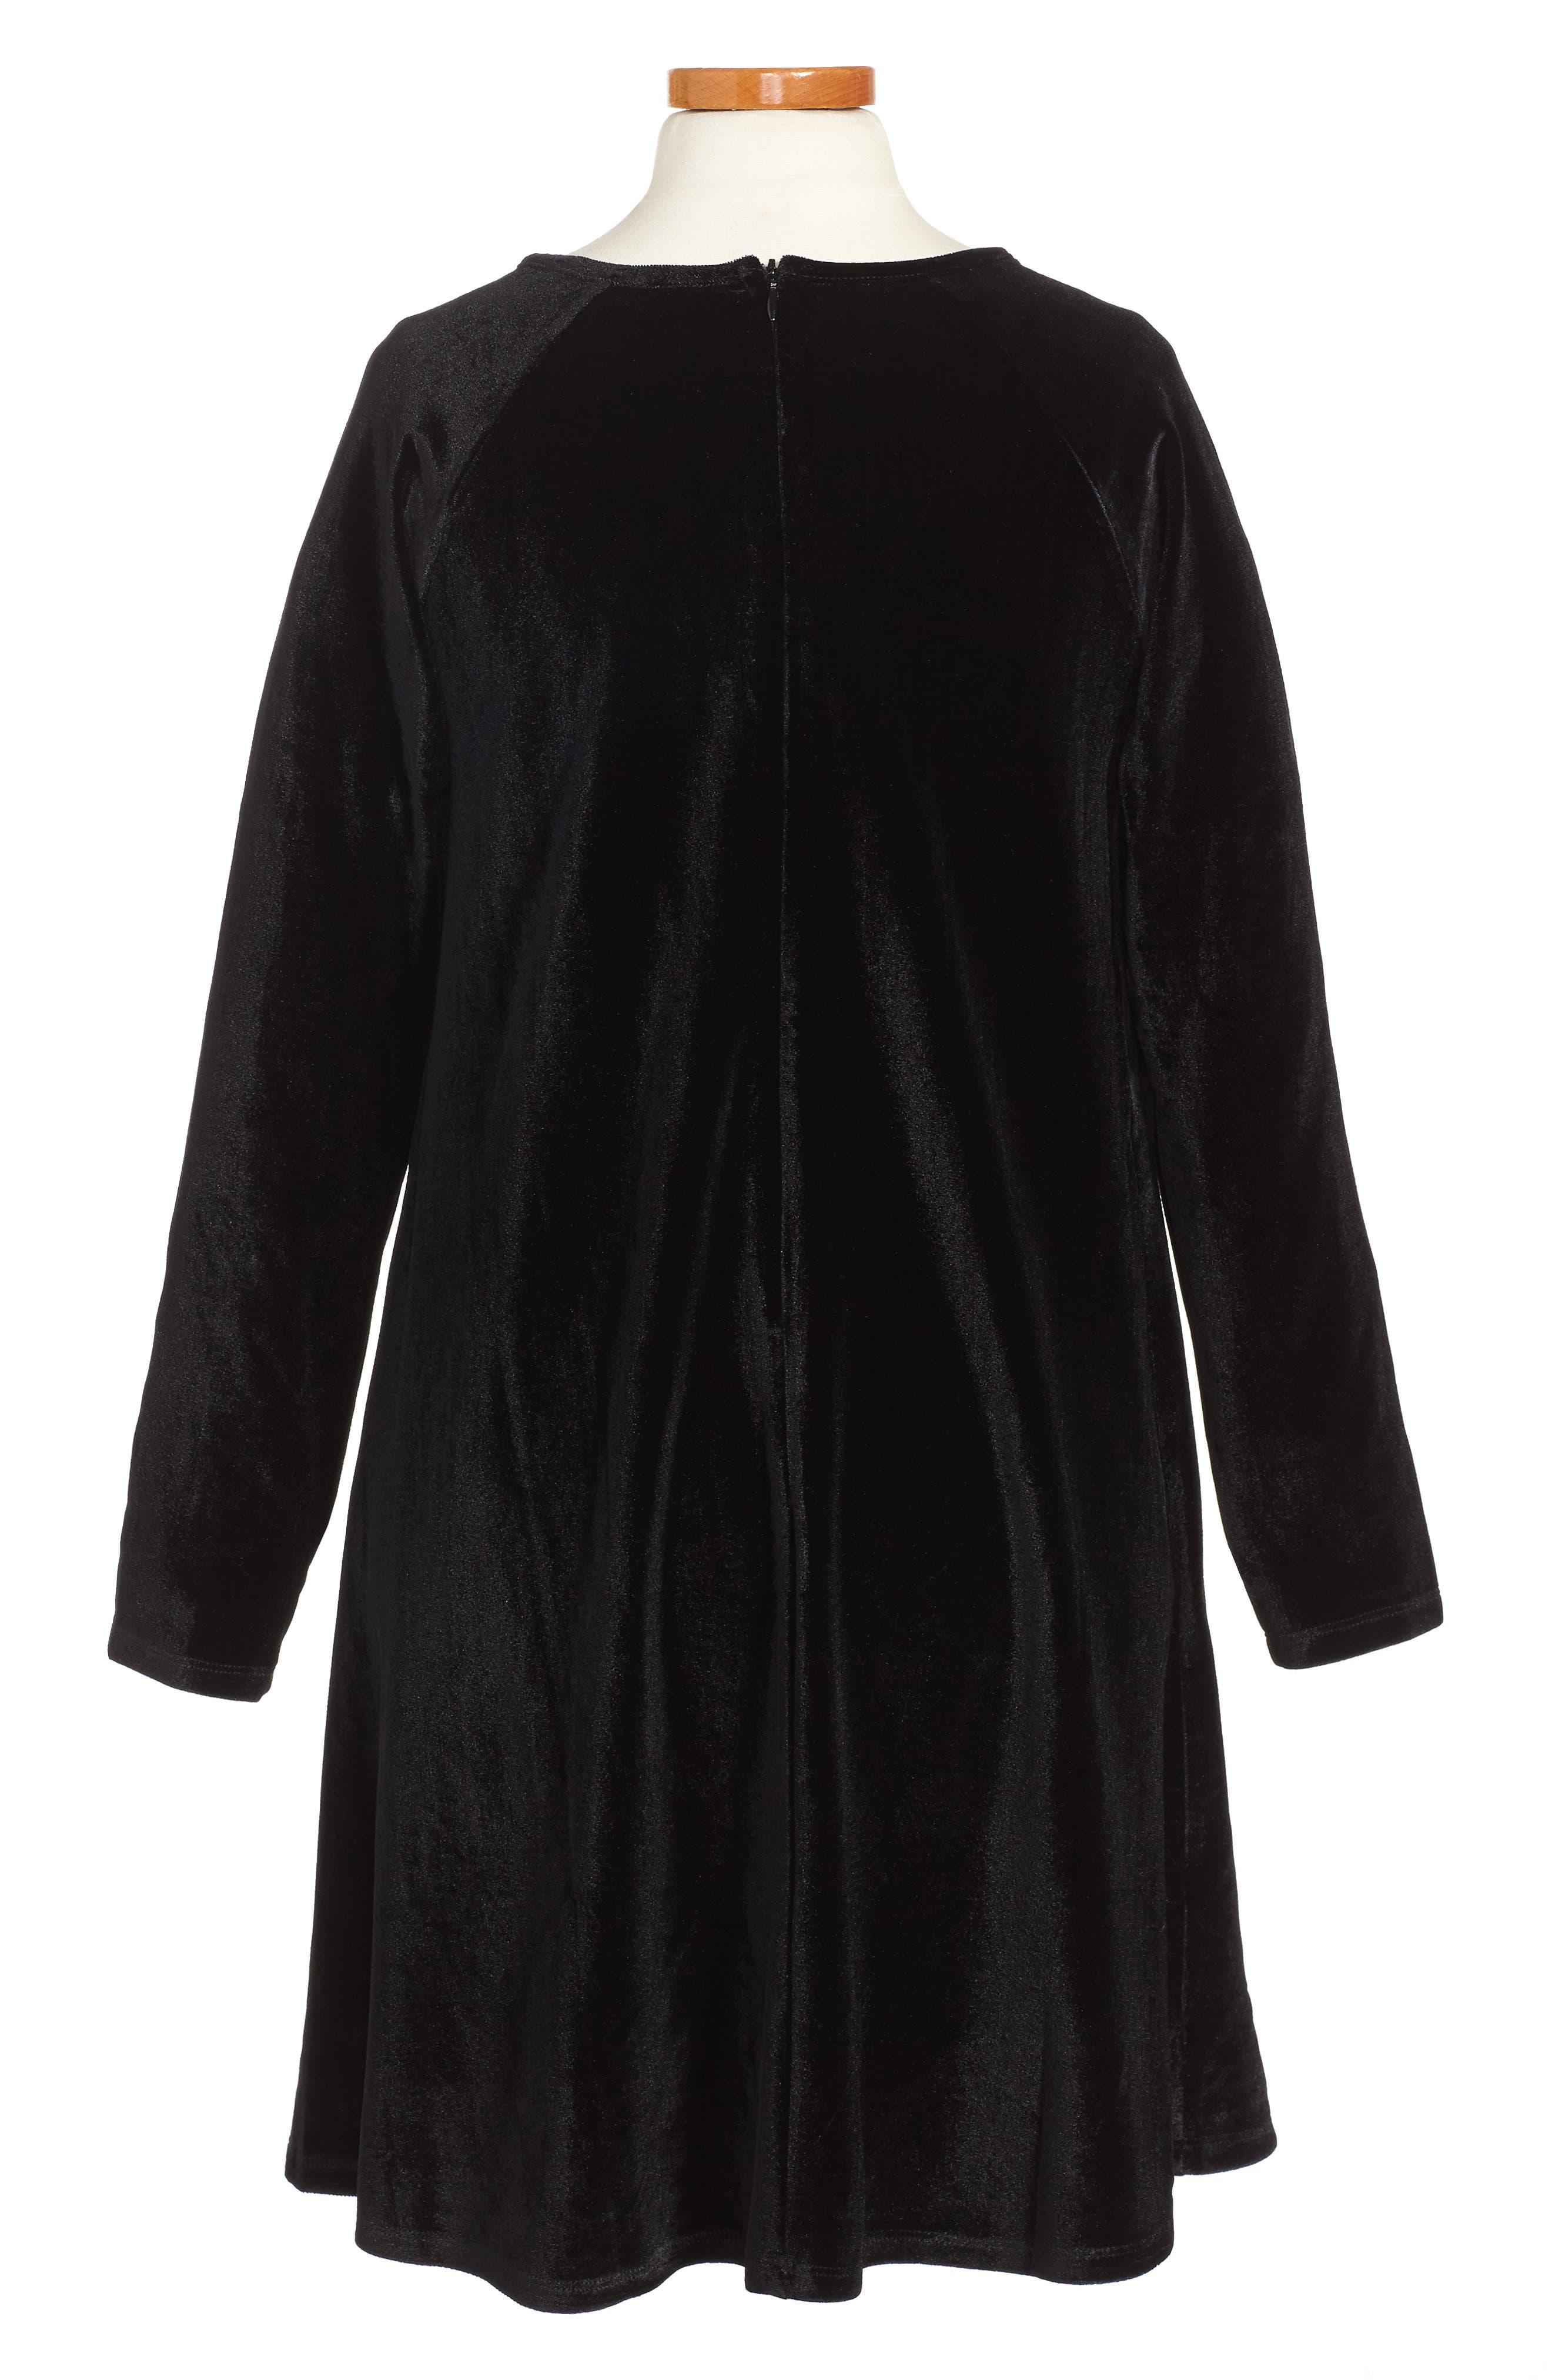 Alternate Image 2  - Miss Behave Barbara Dress (Big Girls)